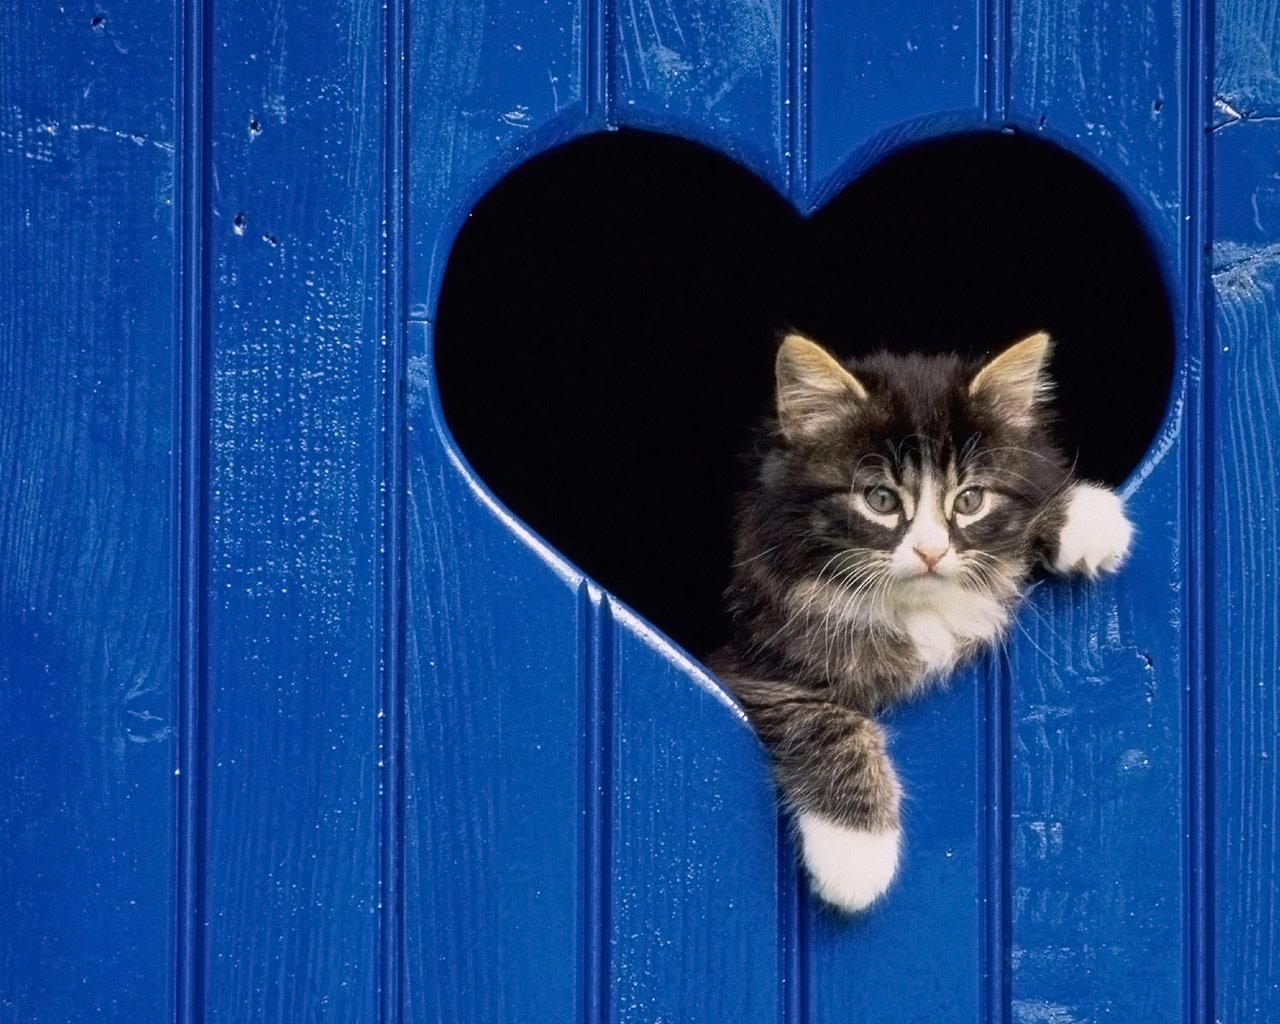 http://2.bp.blogspot.com/-kHFtbkFYb_8/TdlgDT1raKI/AAAAAAAAAGY/SSRkKyzEVG4/s1600/cat_blue_heart_1280x1024.jpg